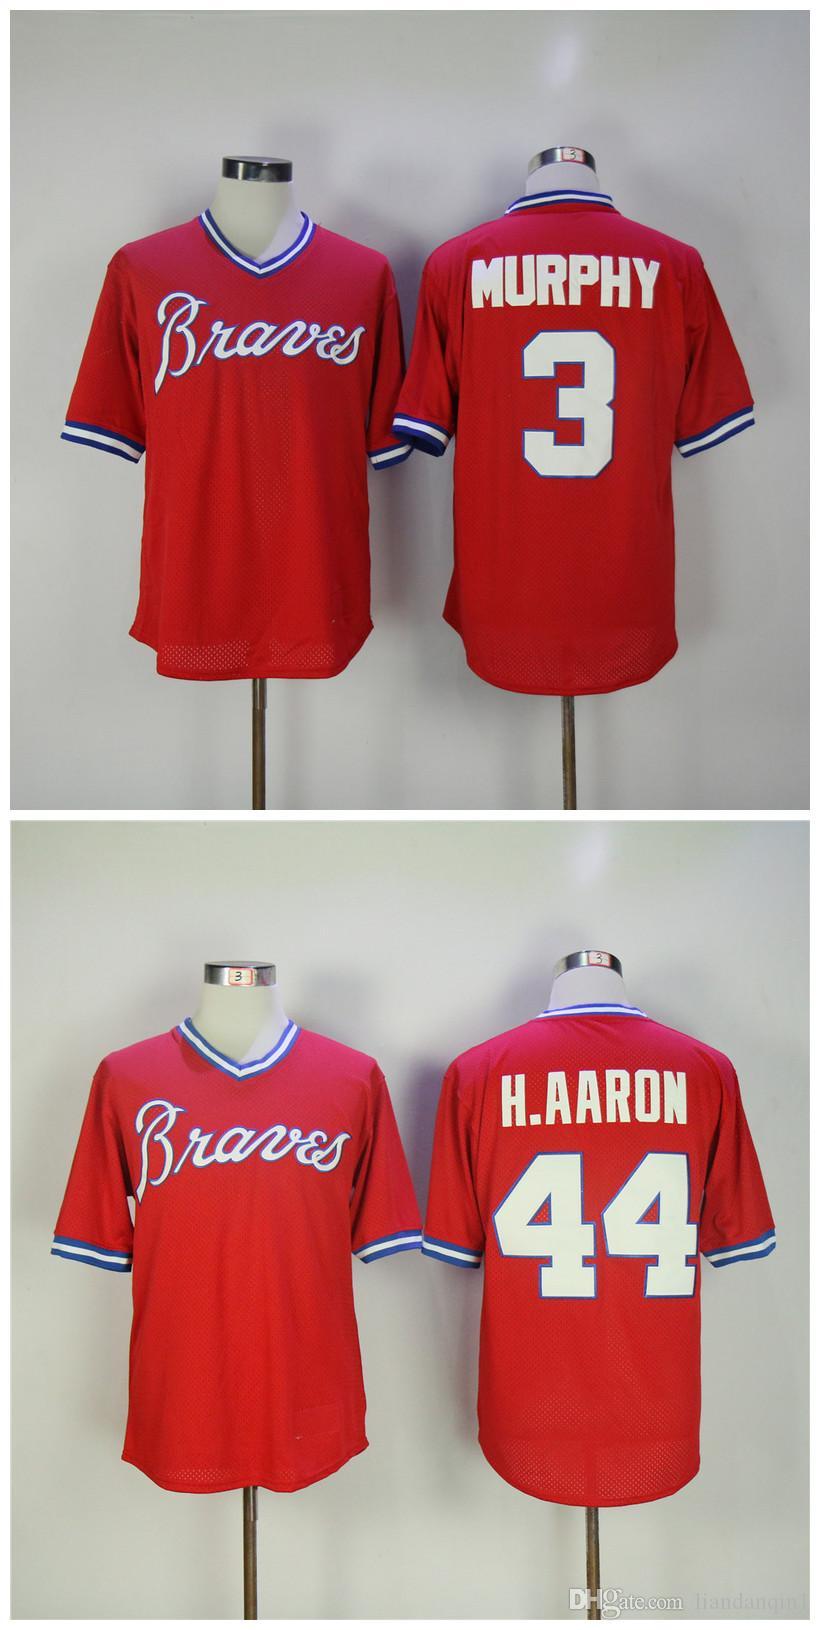 3ecb8f776 ... 2017 1980 retro mens atlanta braves 3 dale murphy 44 hank aaron 5  freeman jersey red